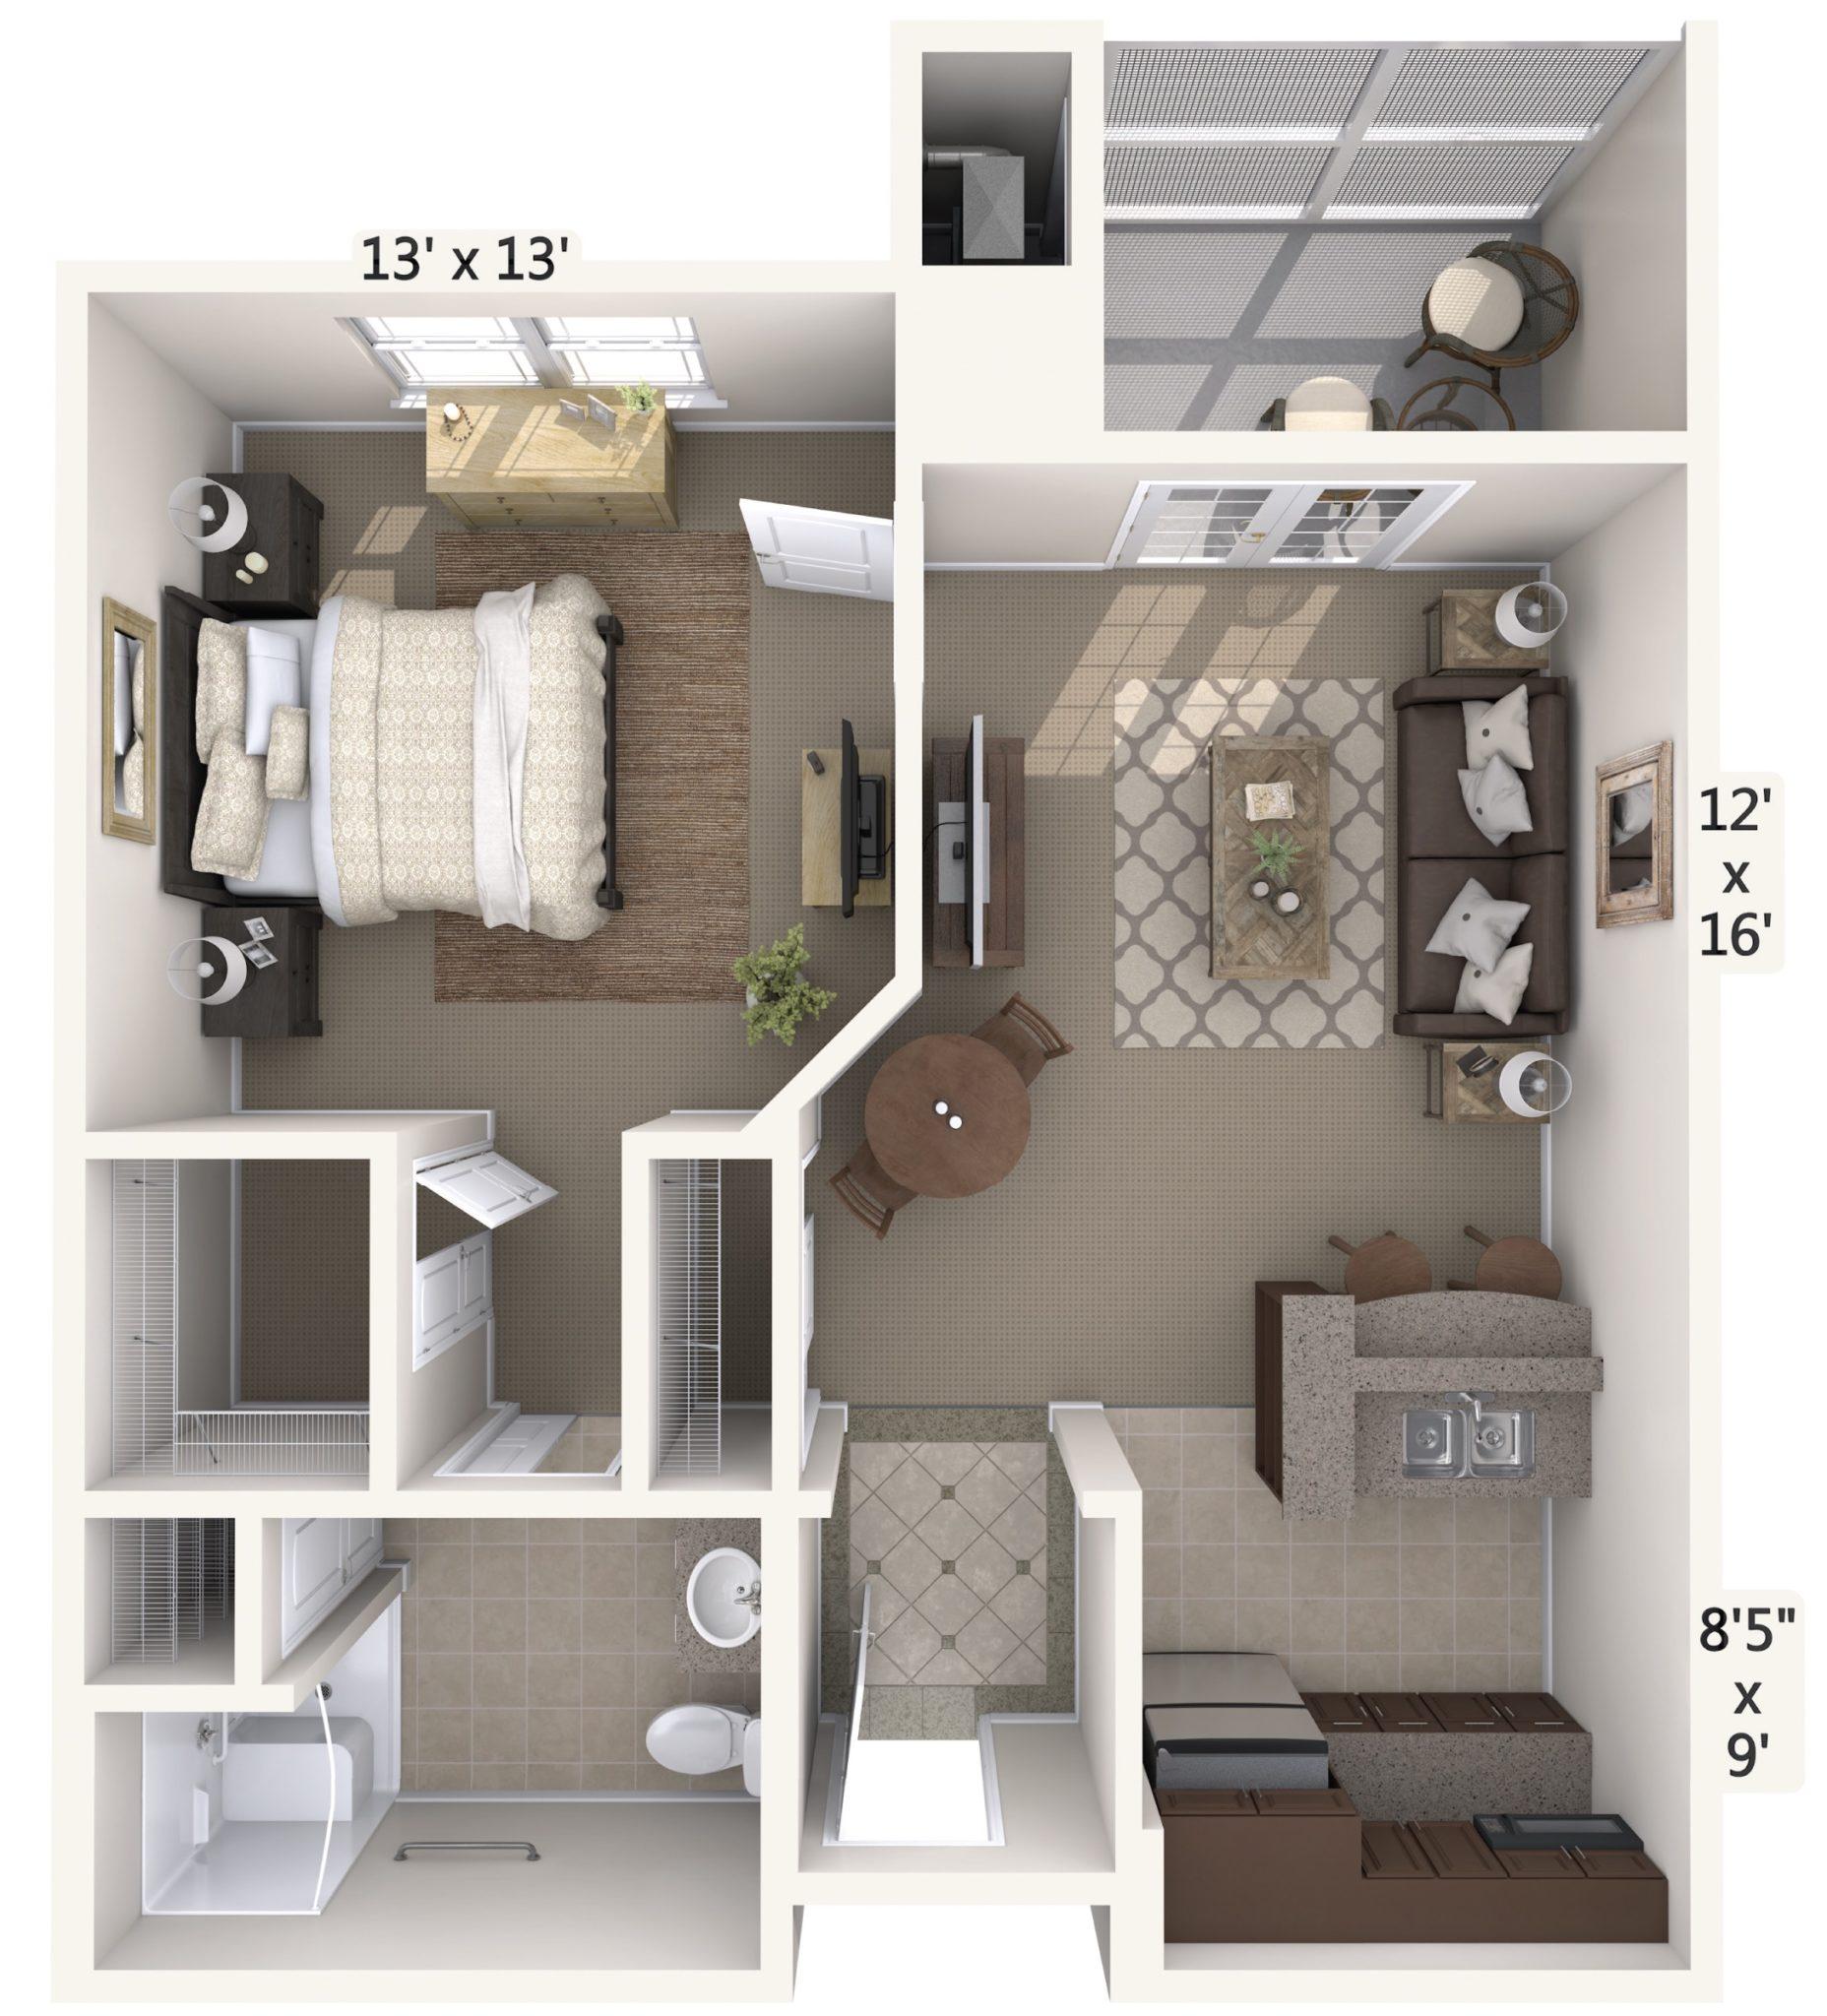 AddingtonPlace_One-Bedroom-Harmony_699-sq.-ft._AL_Stuart-1856x2048